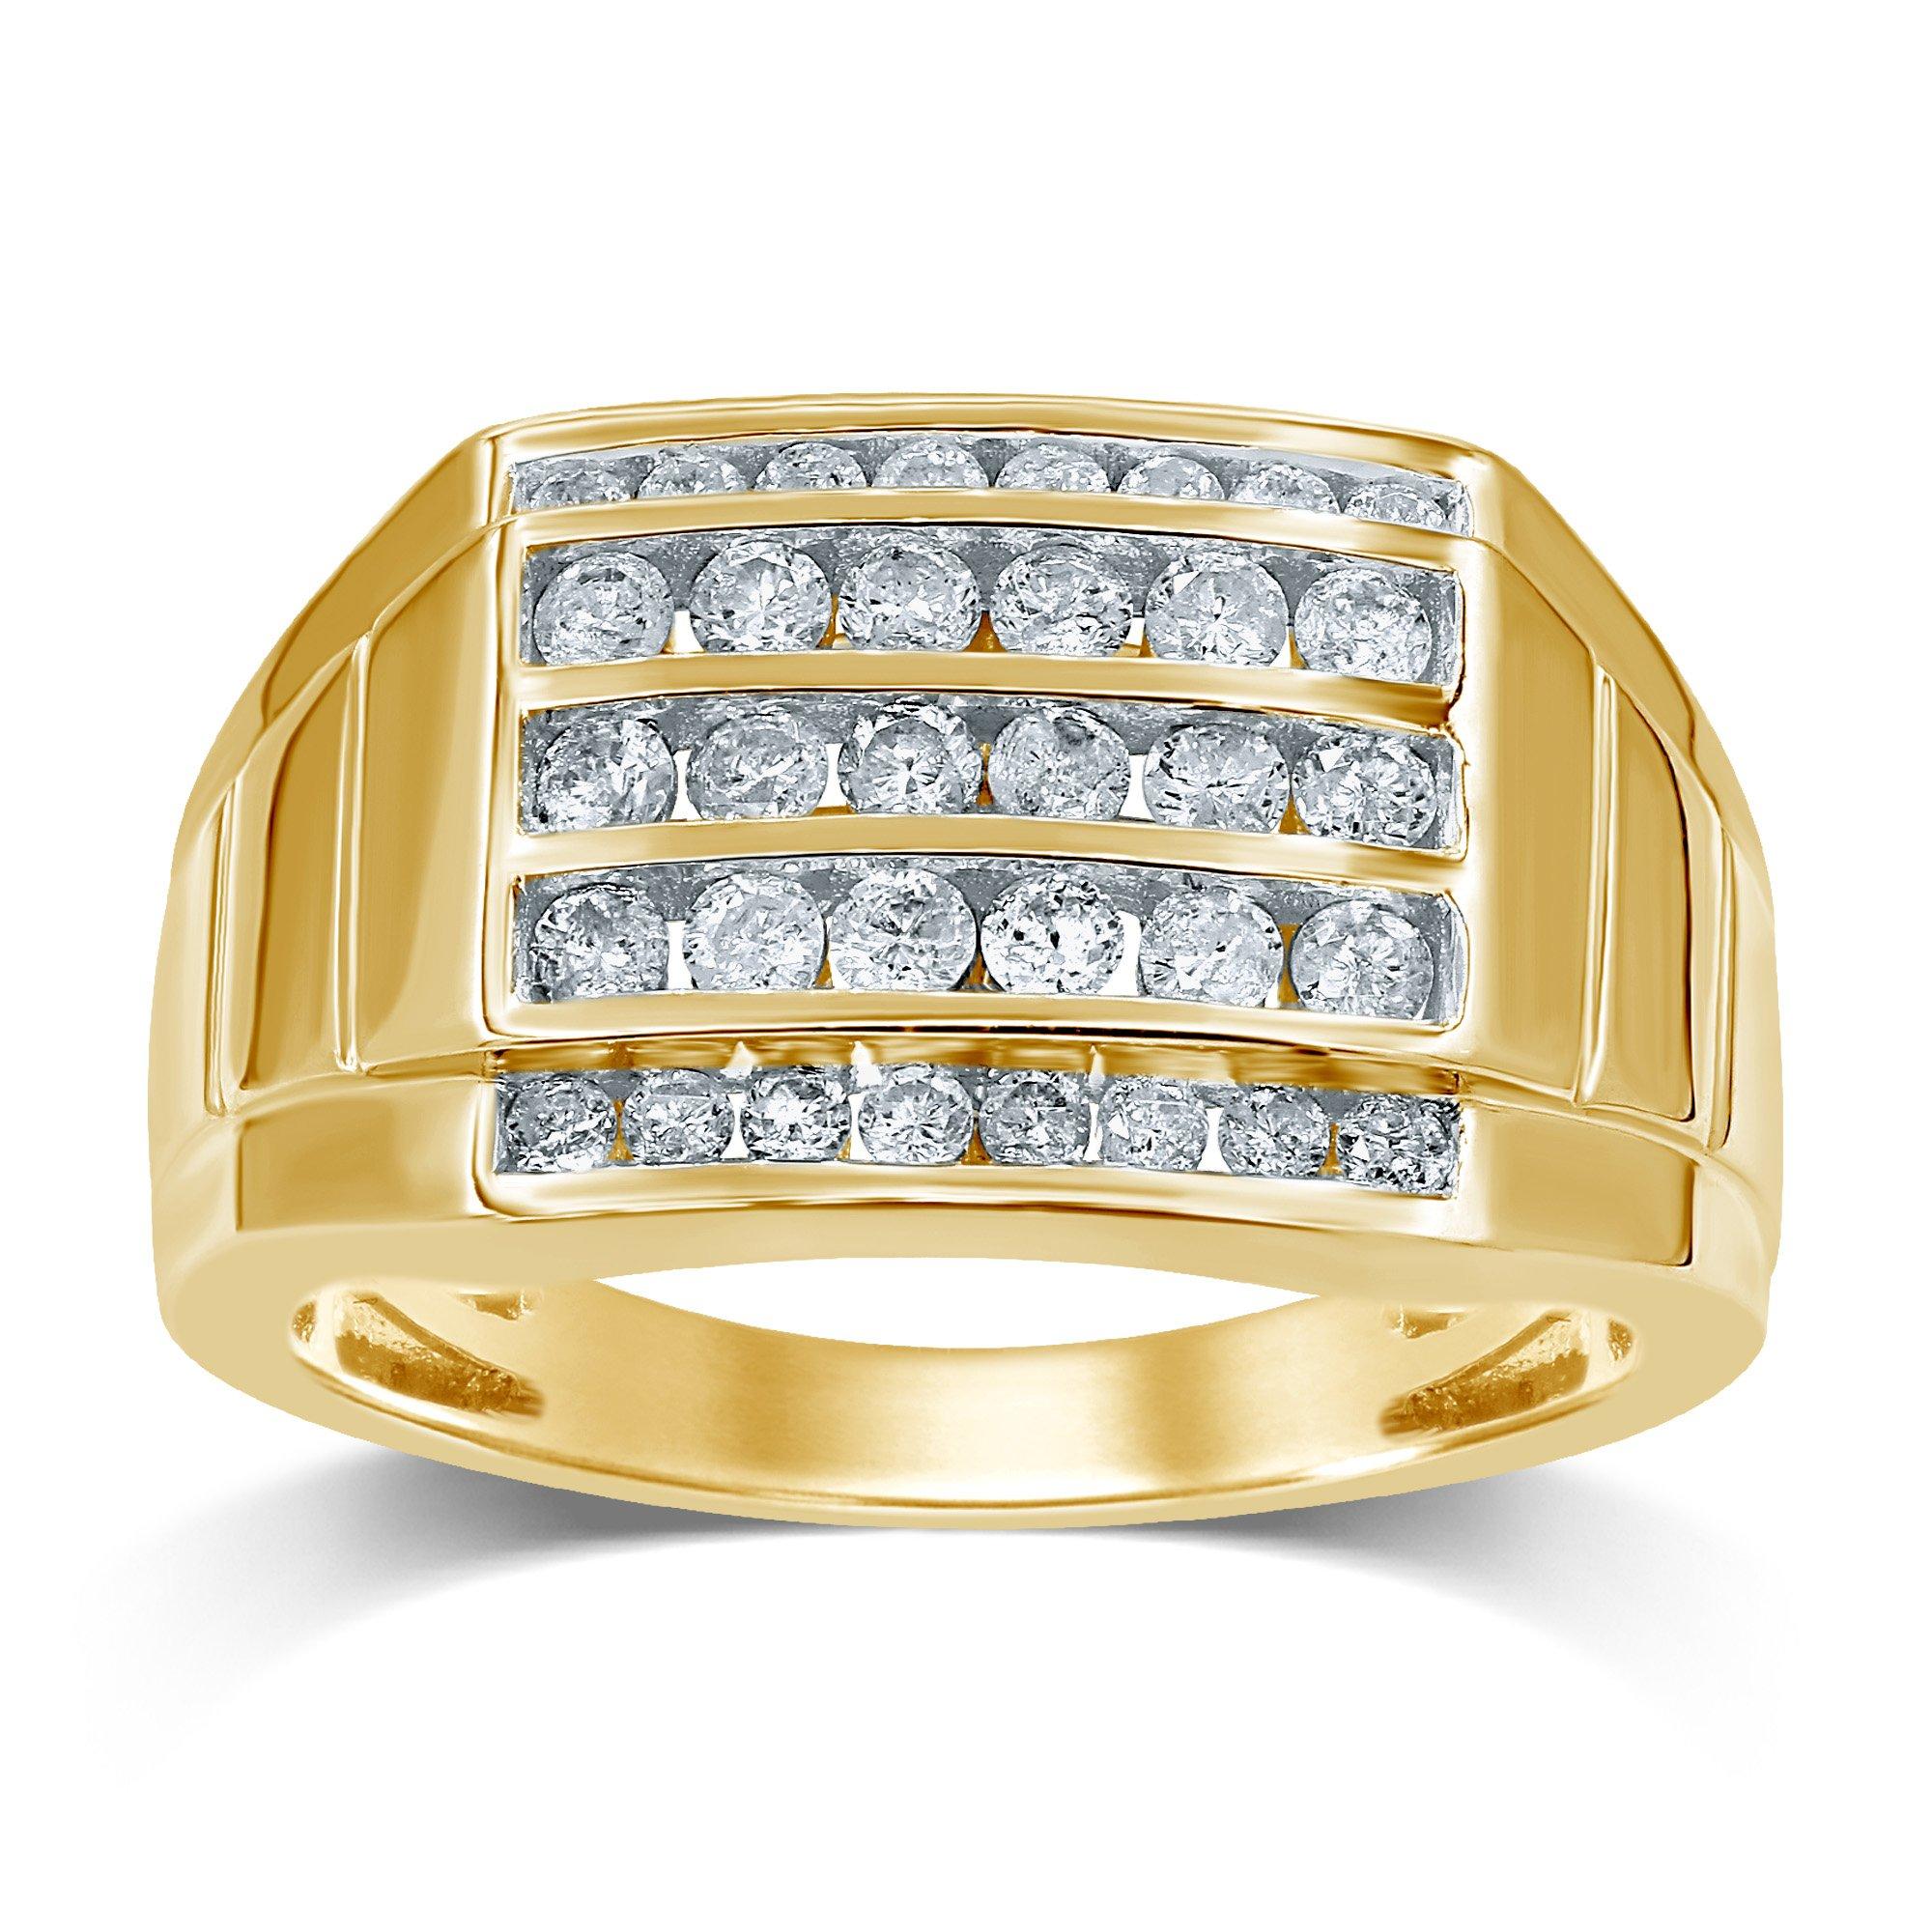 9ct Yellow Gold 1 Carat 5 Row Channel Set Diamond Mens Ring